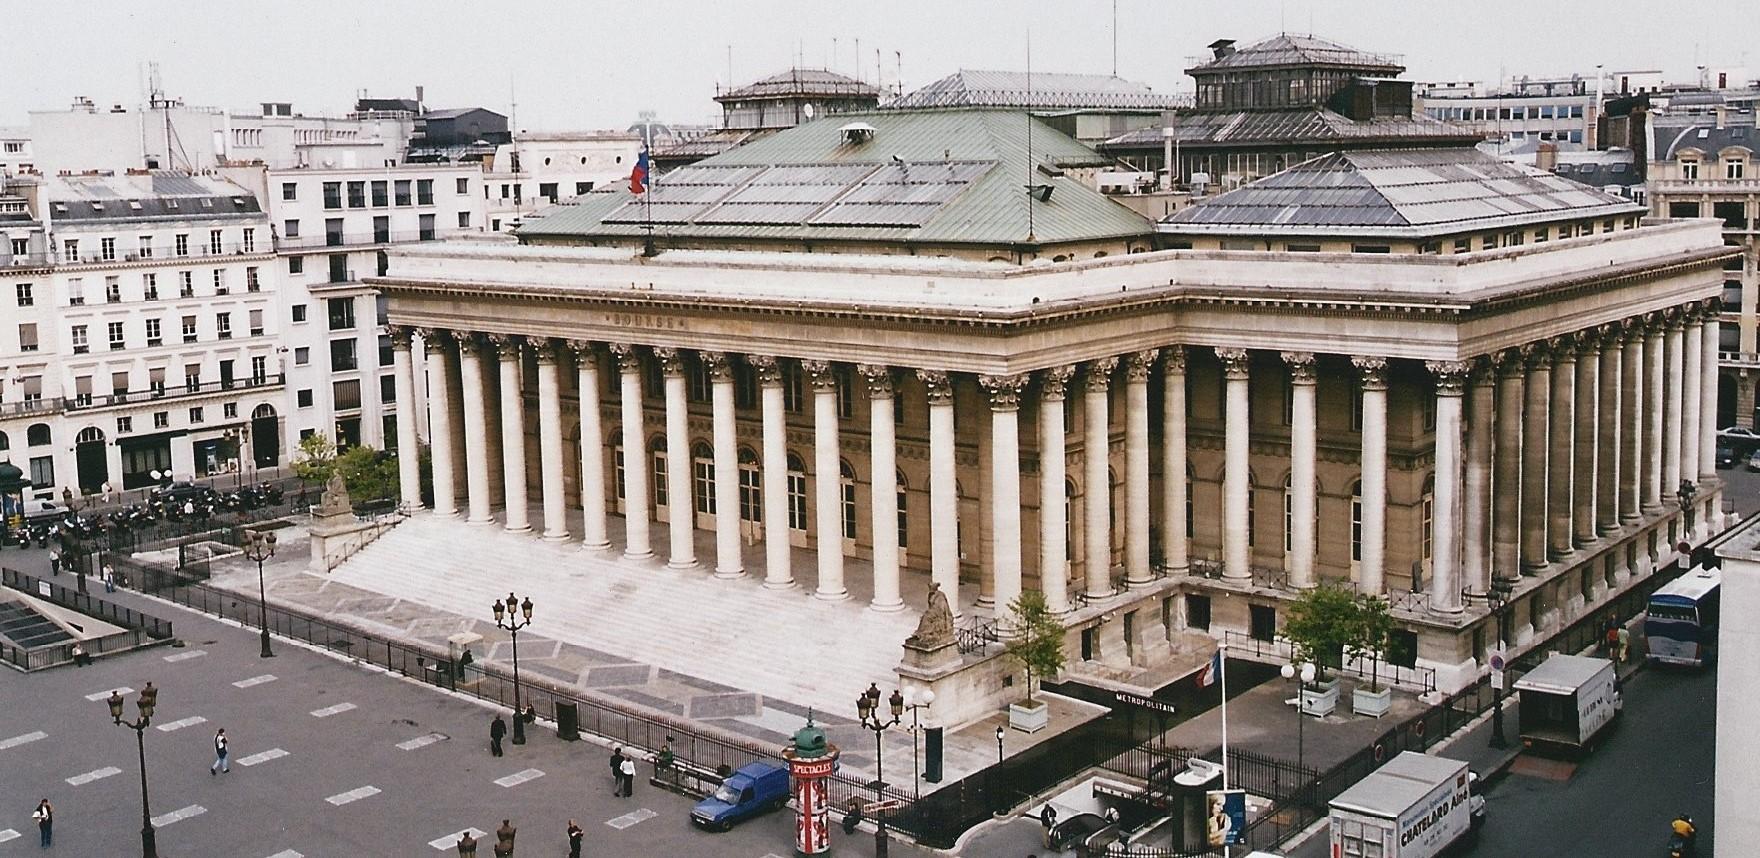 Charlottepasteles pasteler a francesa a domicilio - Salon palais brongniart ...